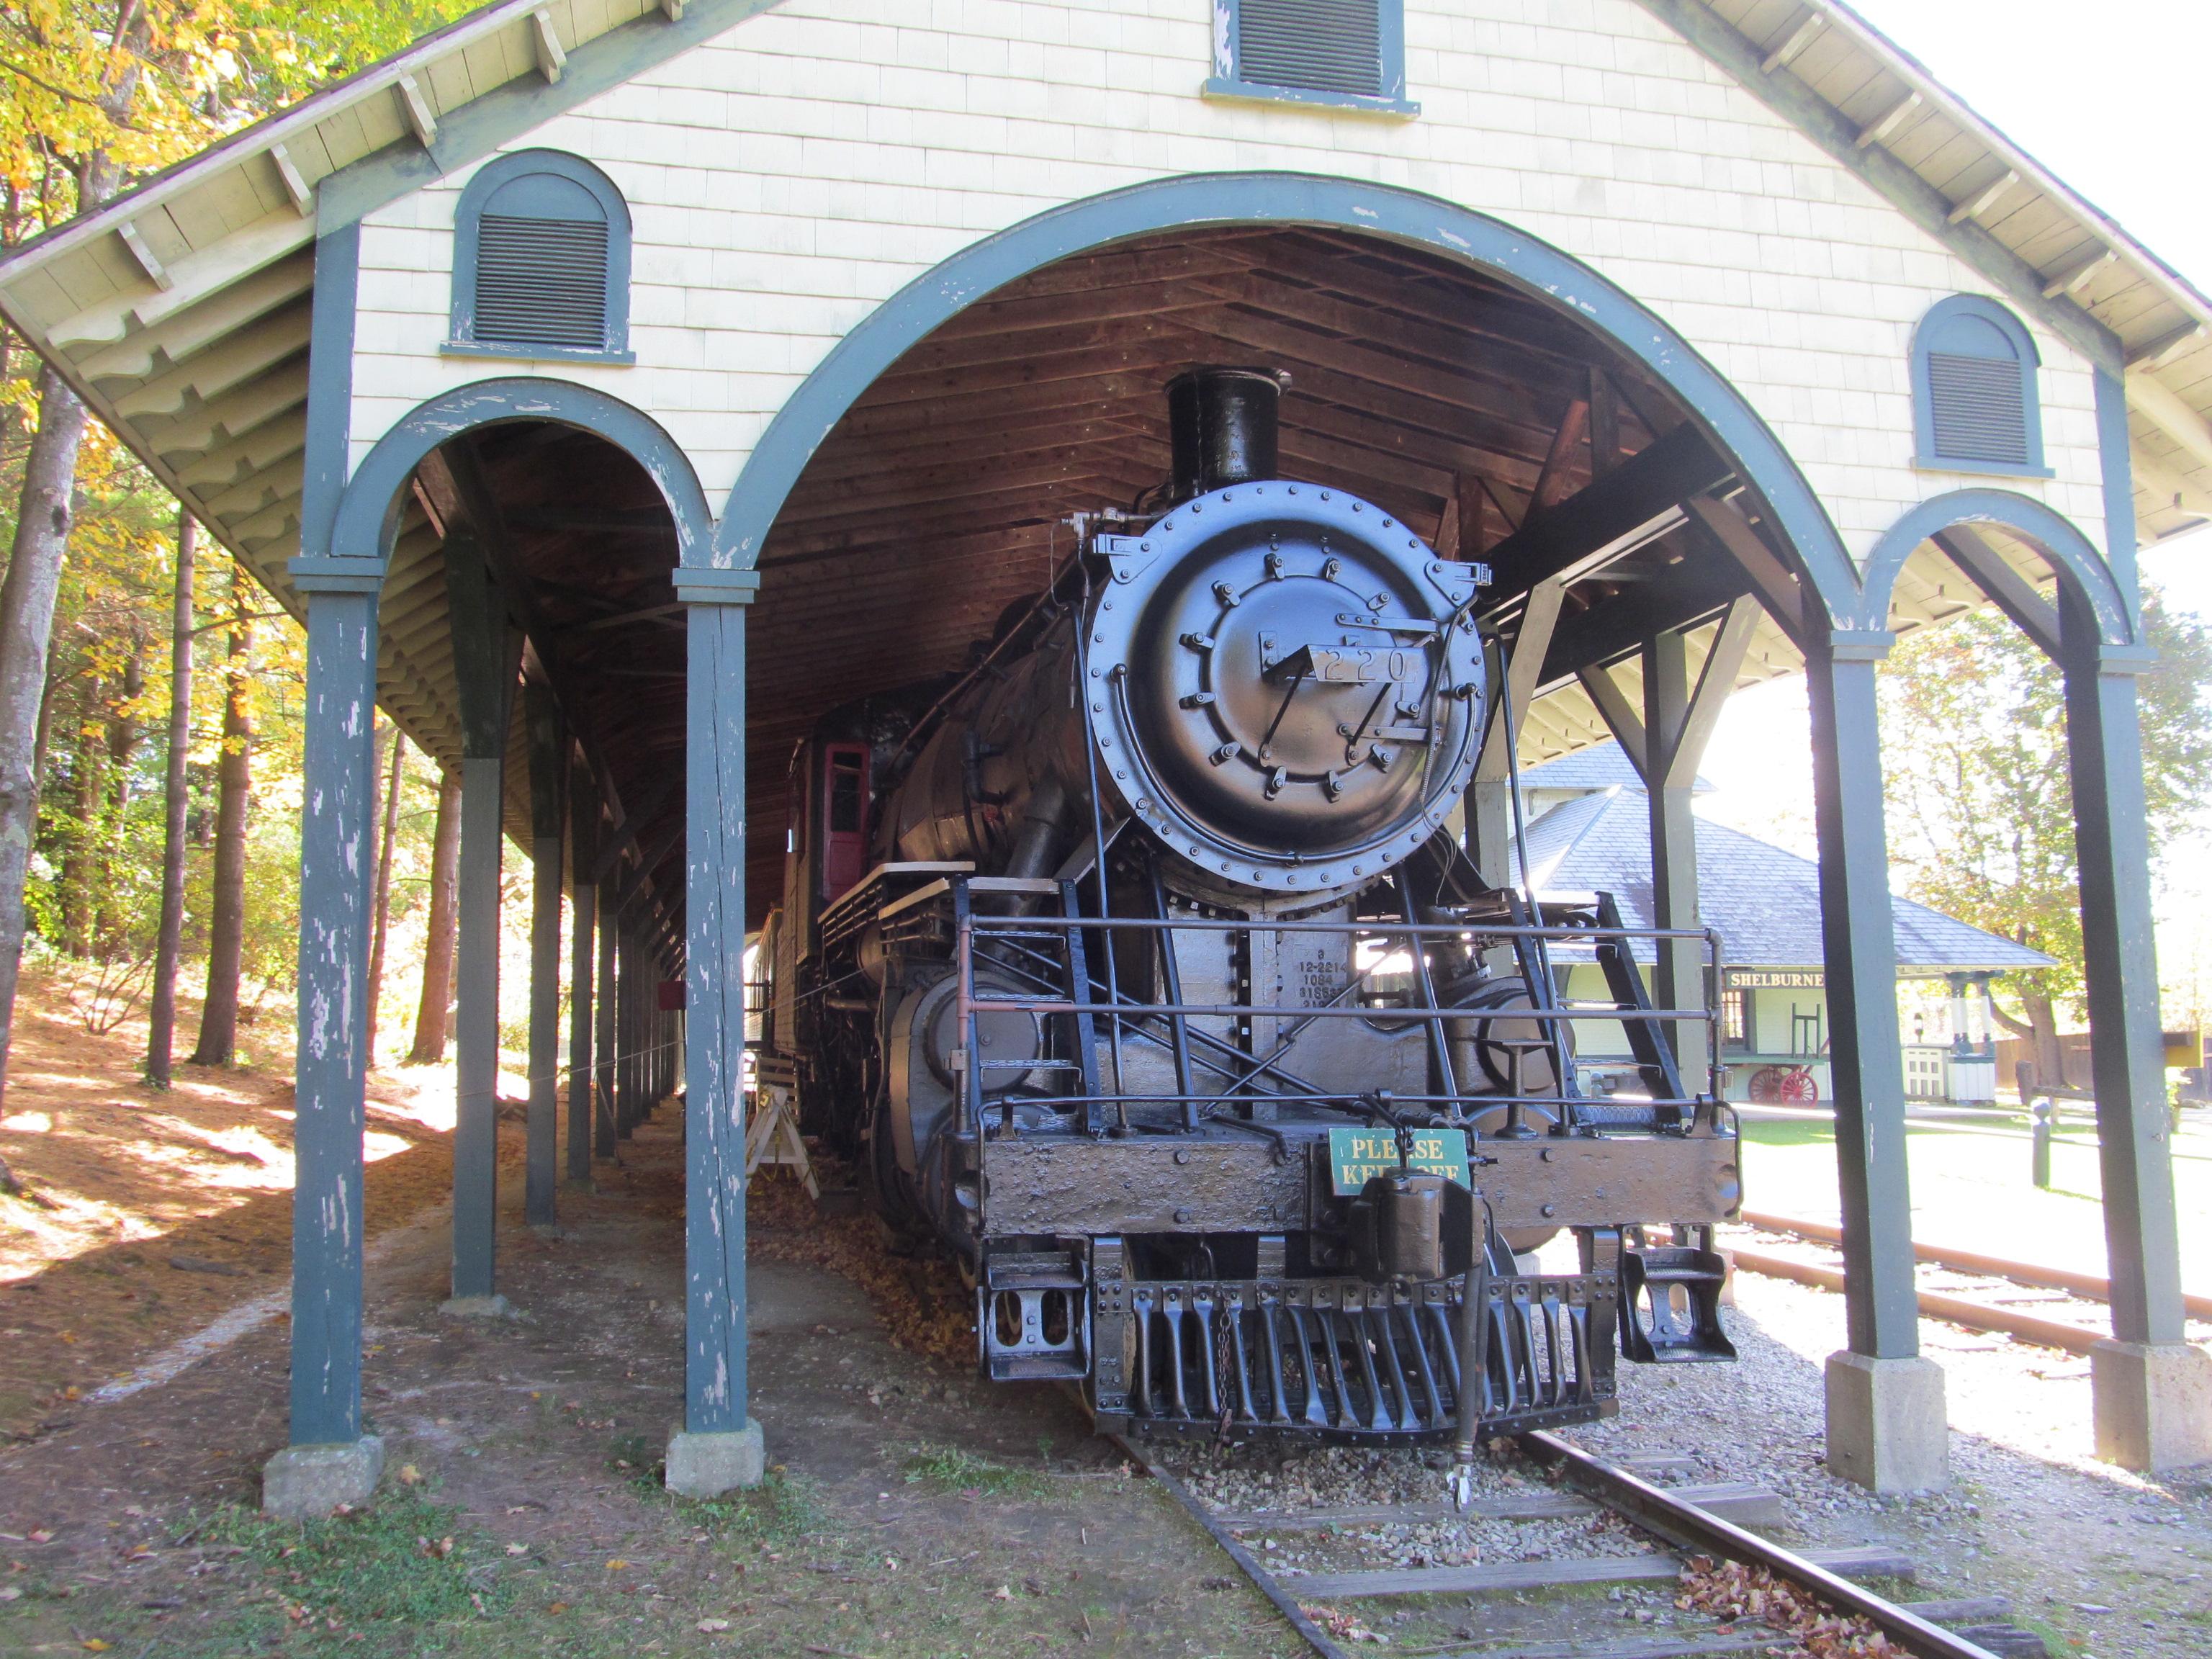 File:Rail Locomotive No 220, Shelburne Museum, Shelburne